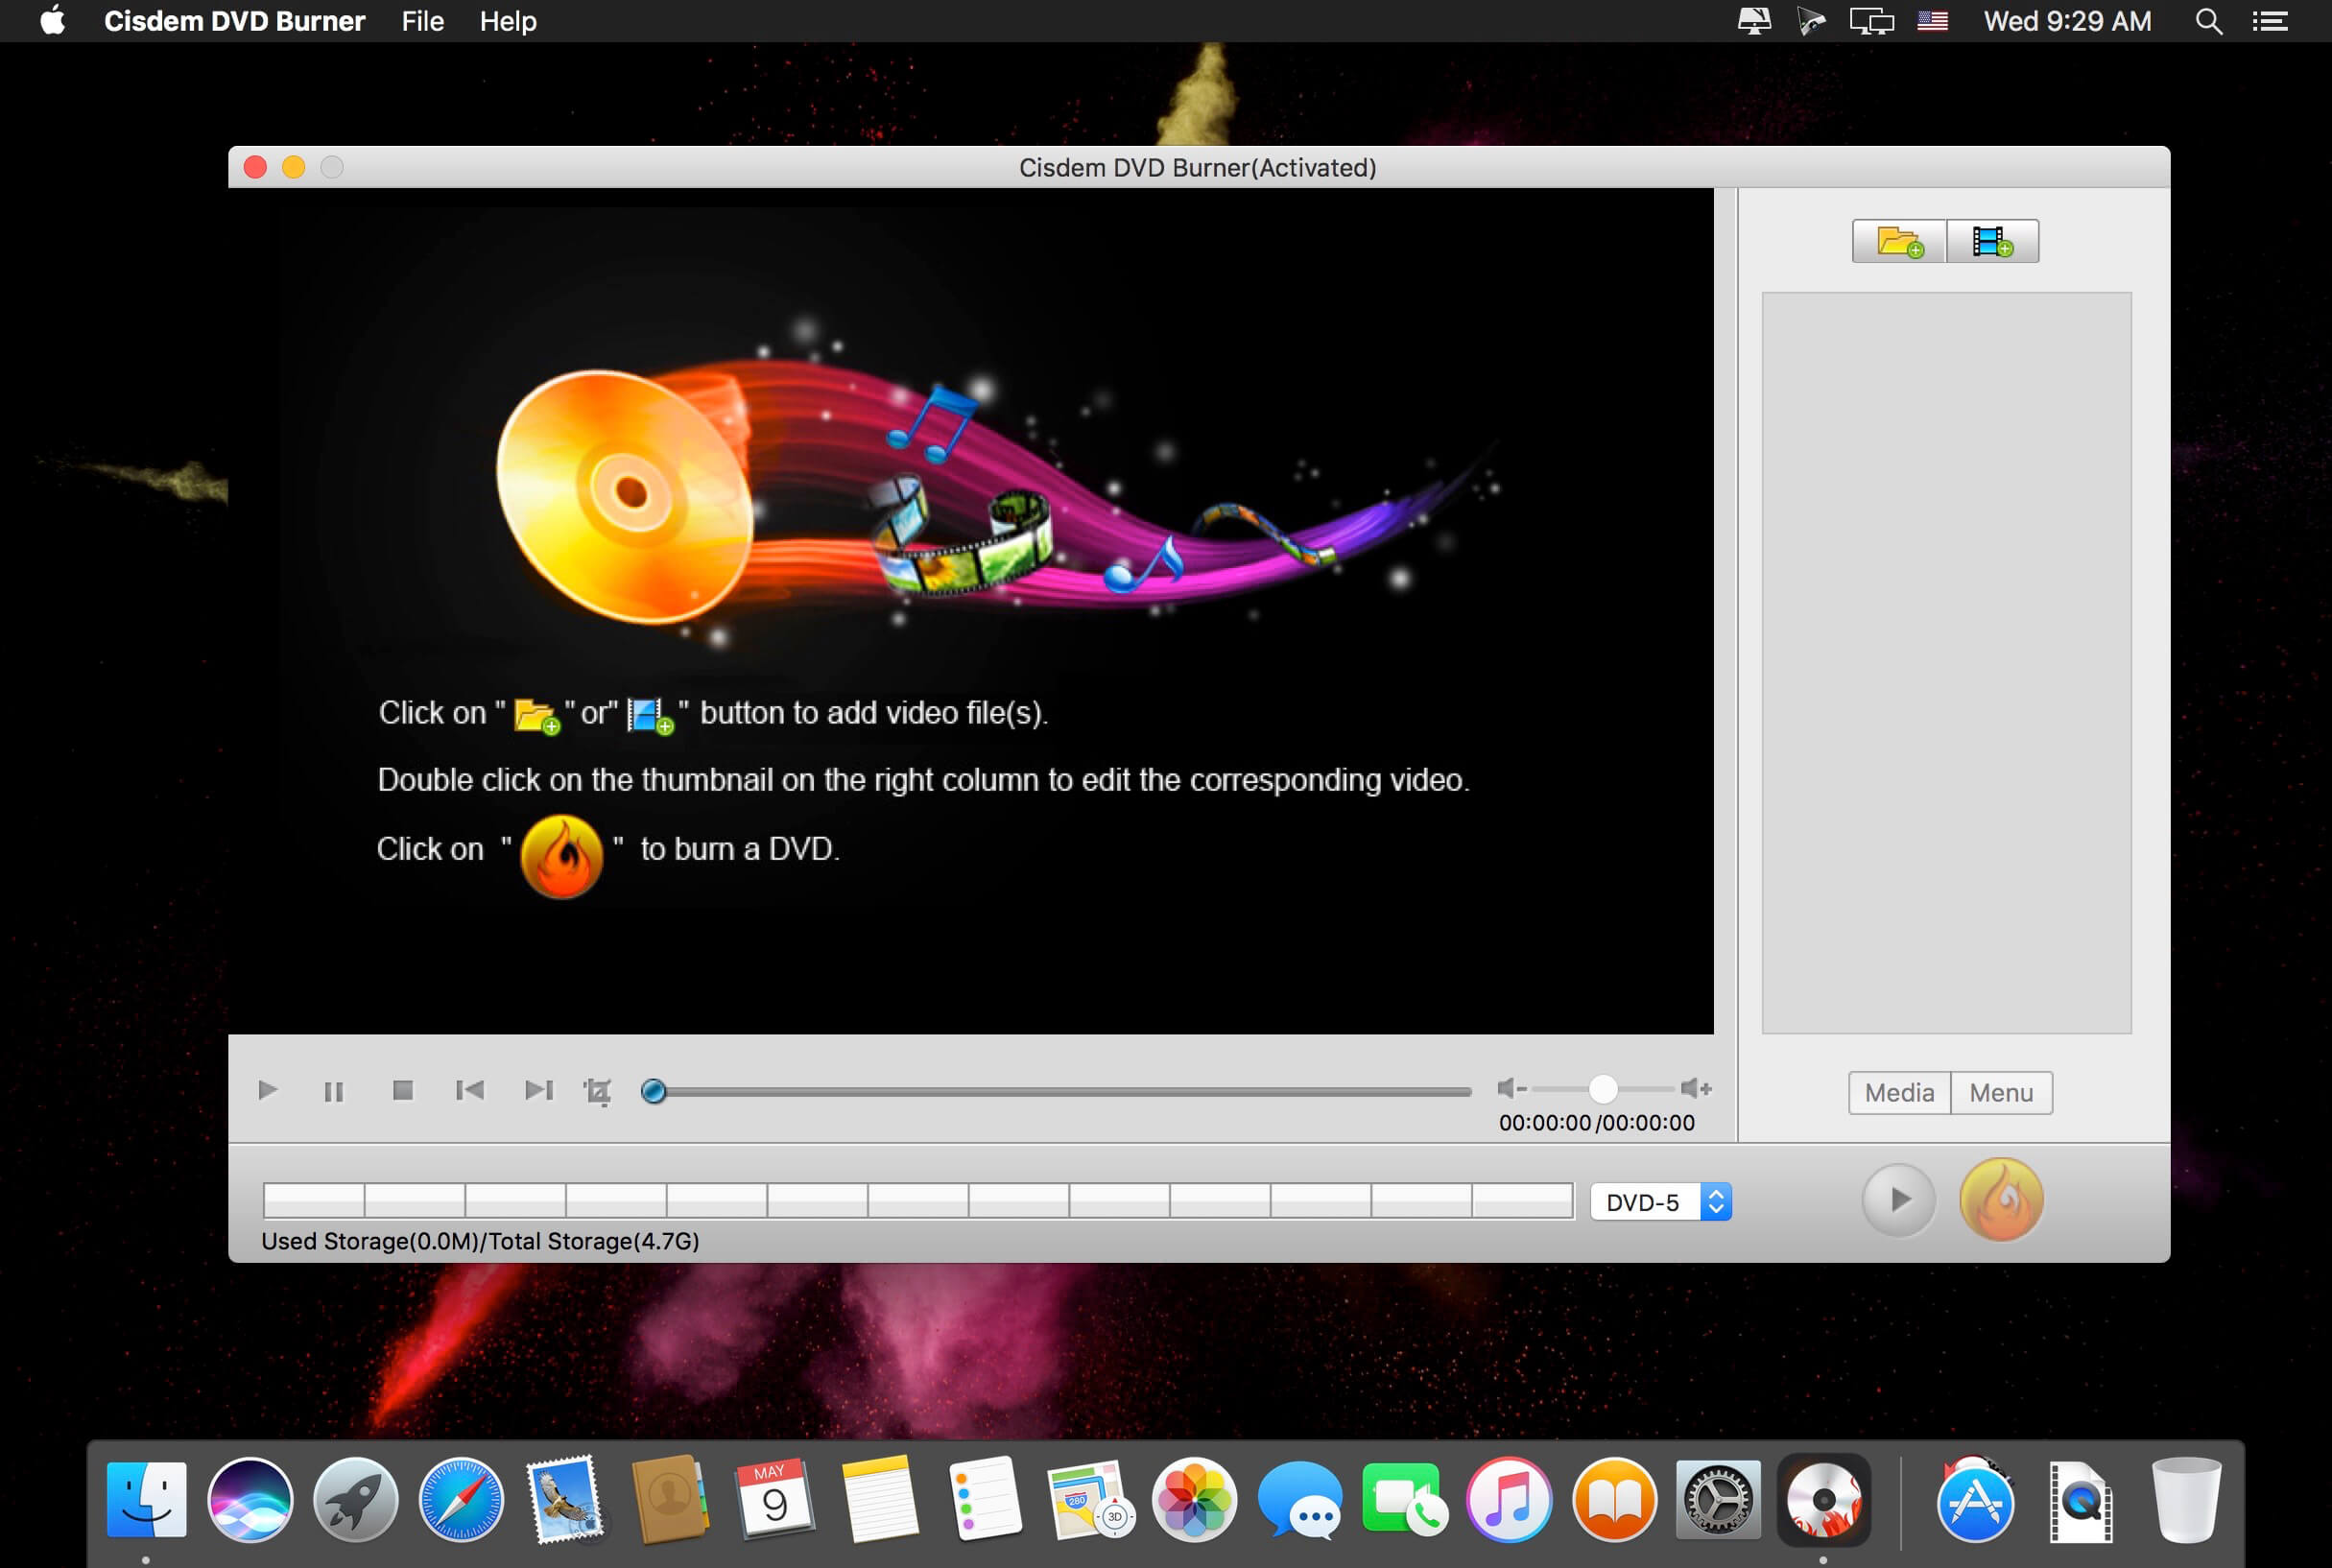 Cisdem-DVDBurner-5-DMG-Download-Downloadies